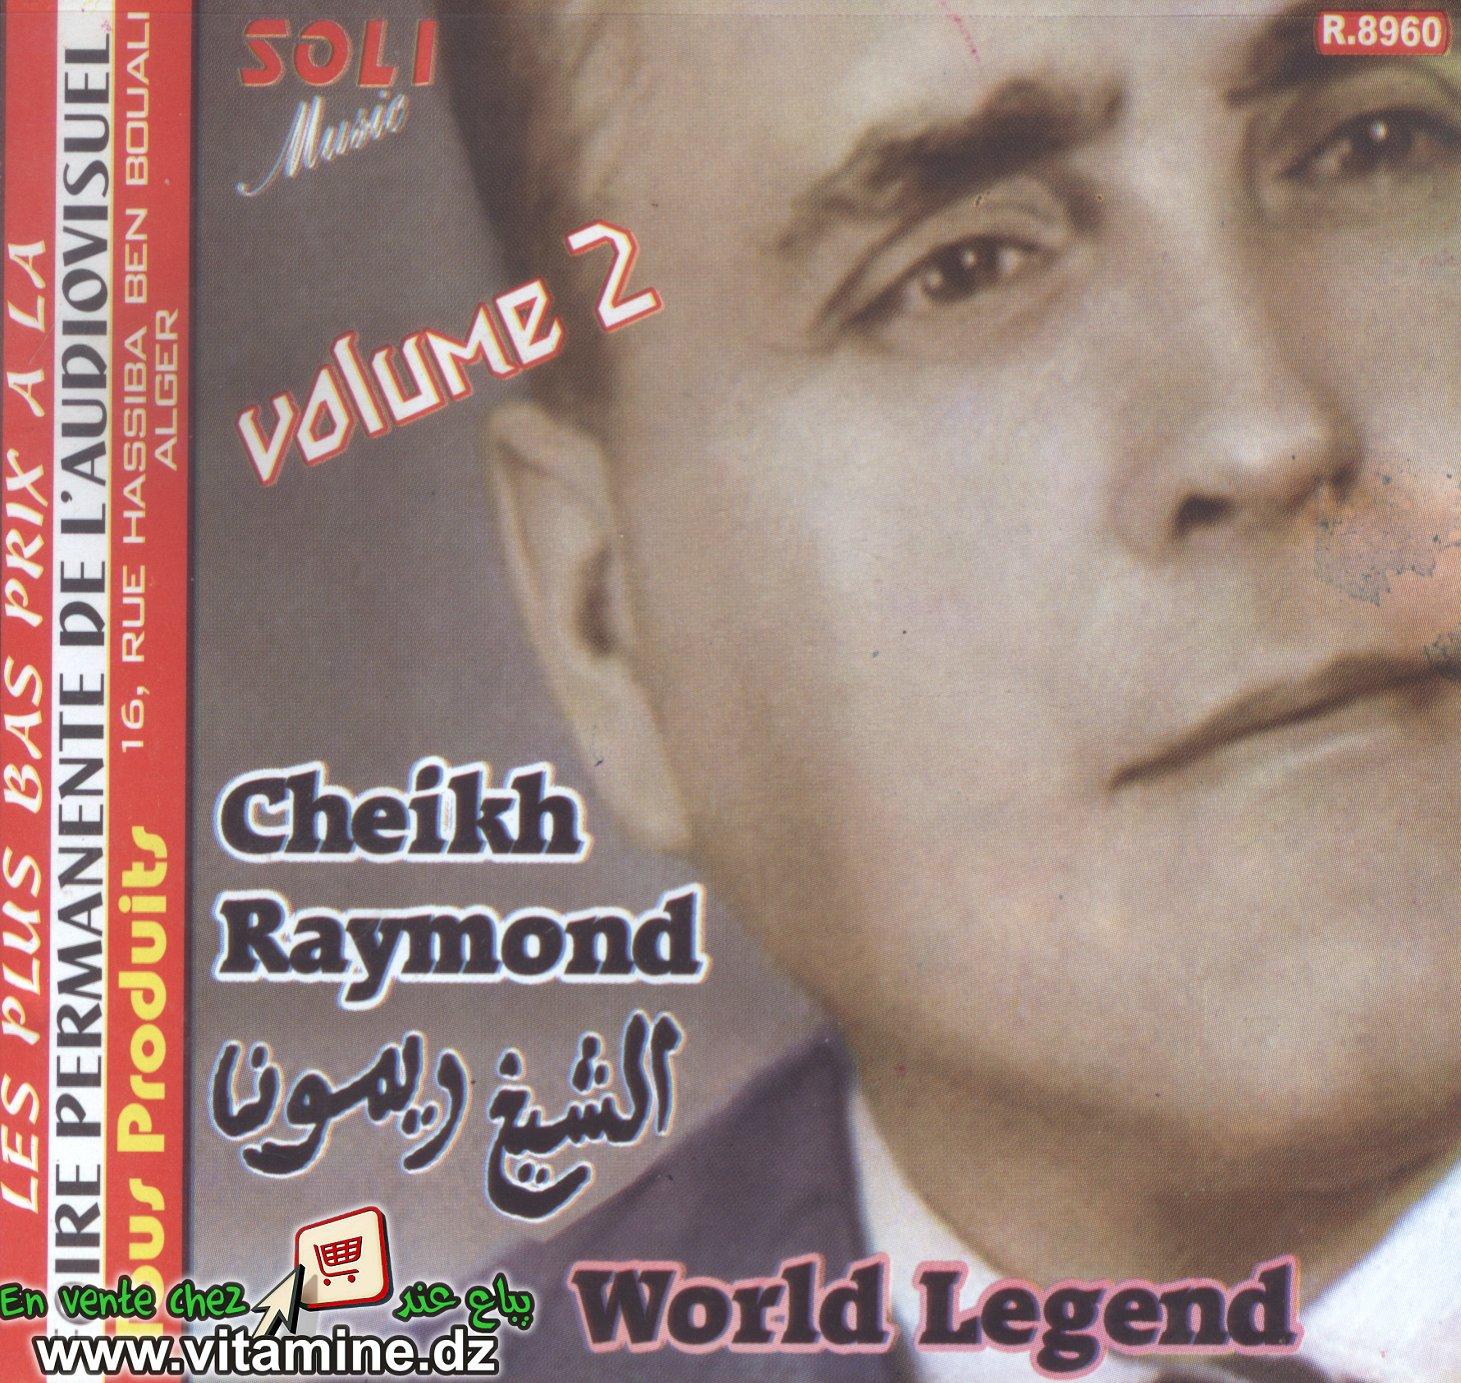 Cheikh Raymond - compilation vol 2